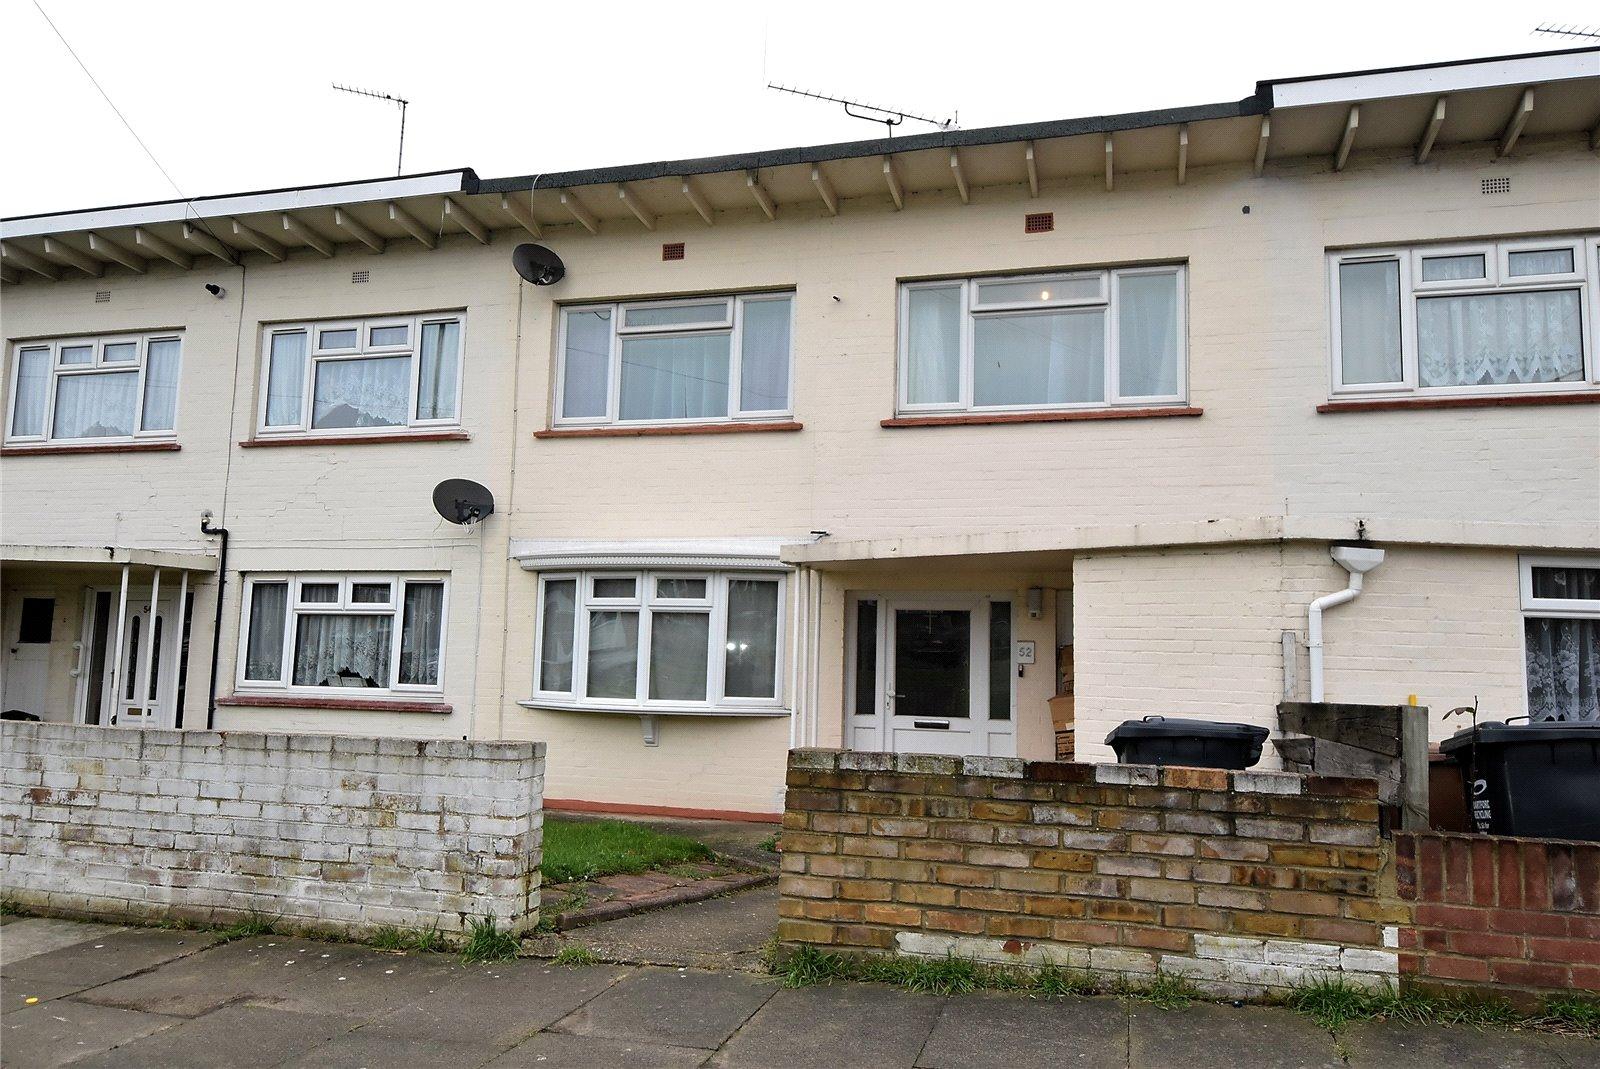 Henderson Drive, Dartford, Kent, DA1